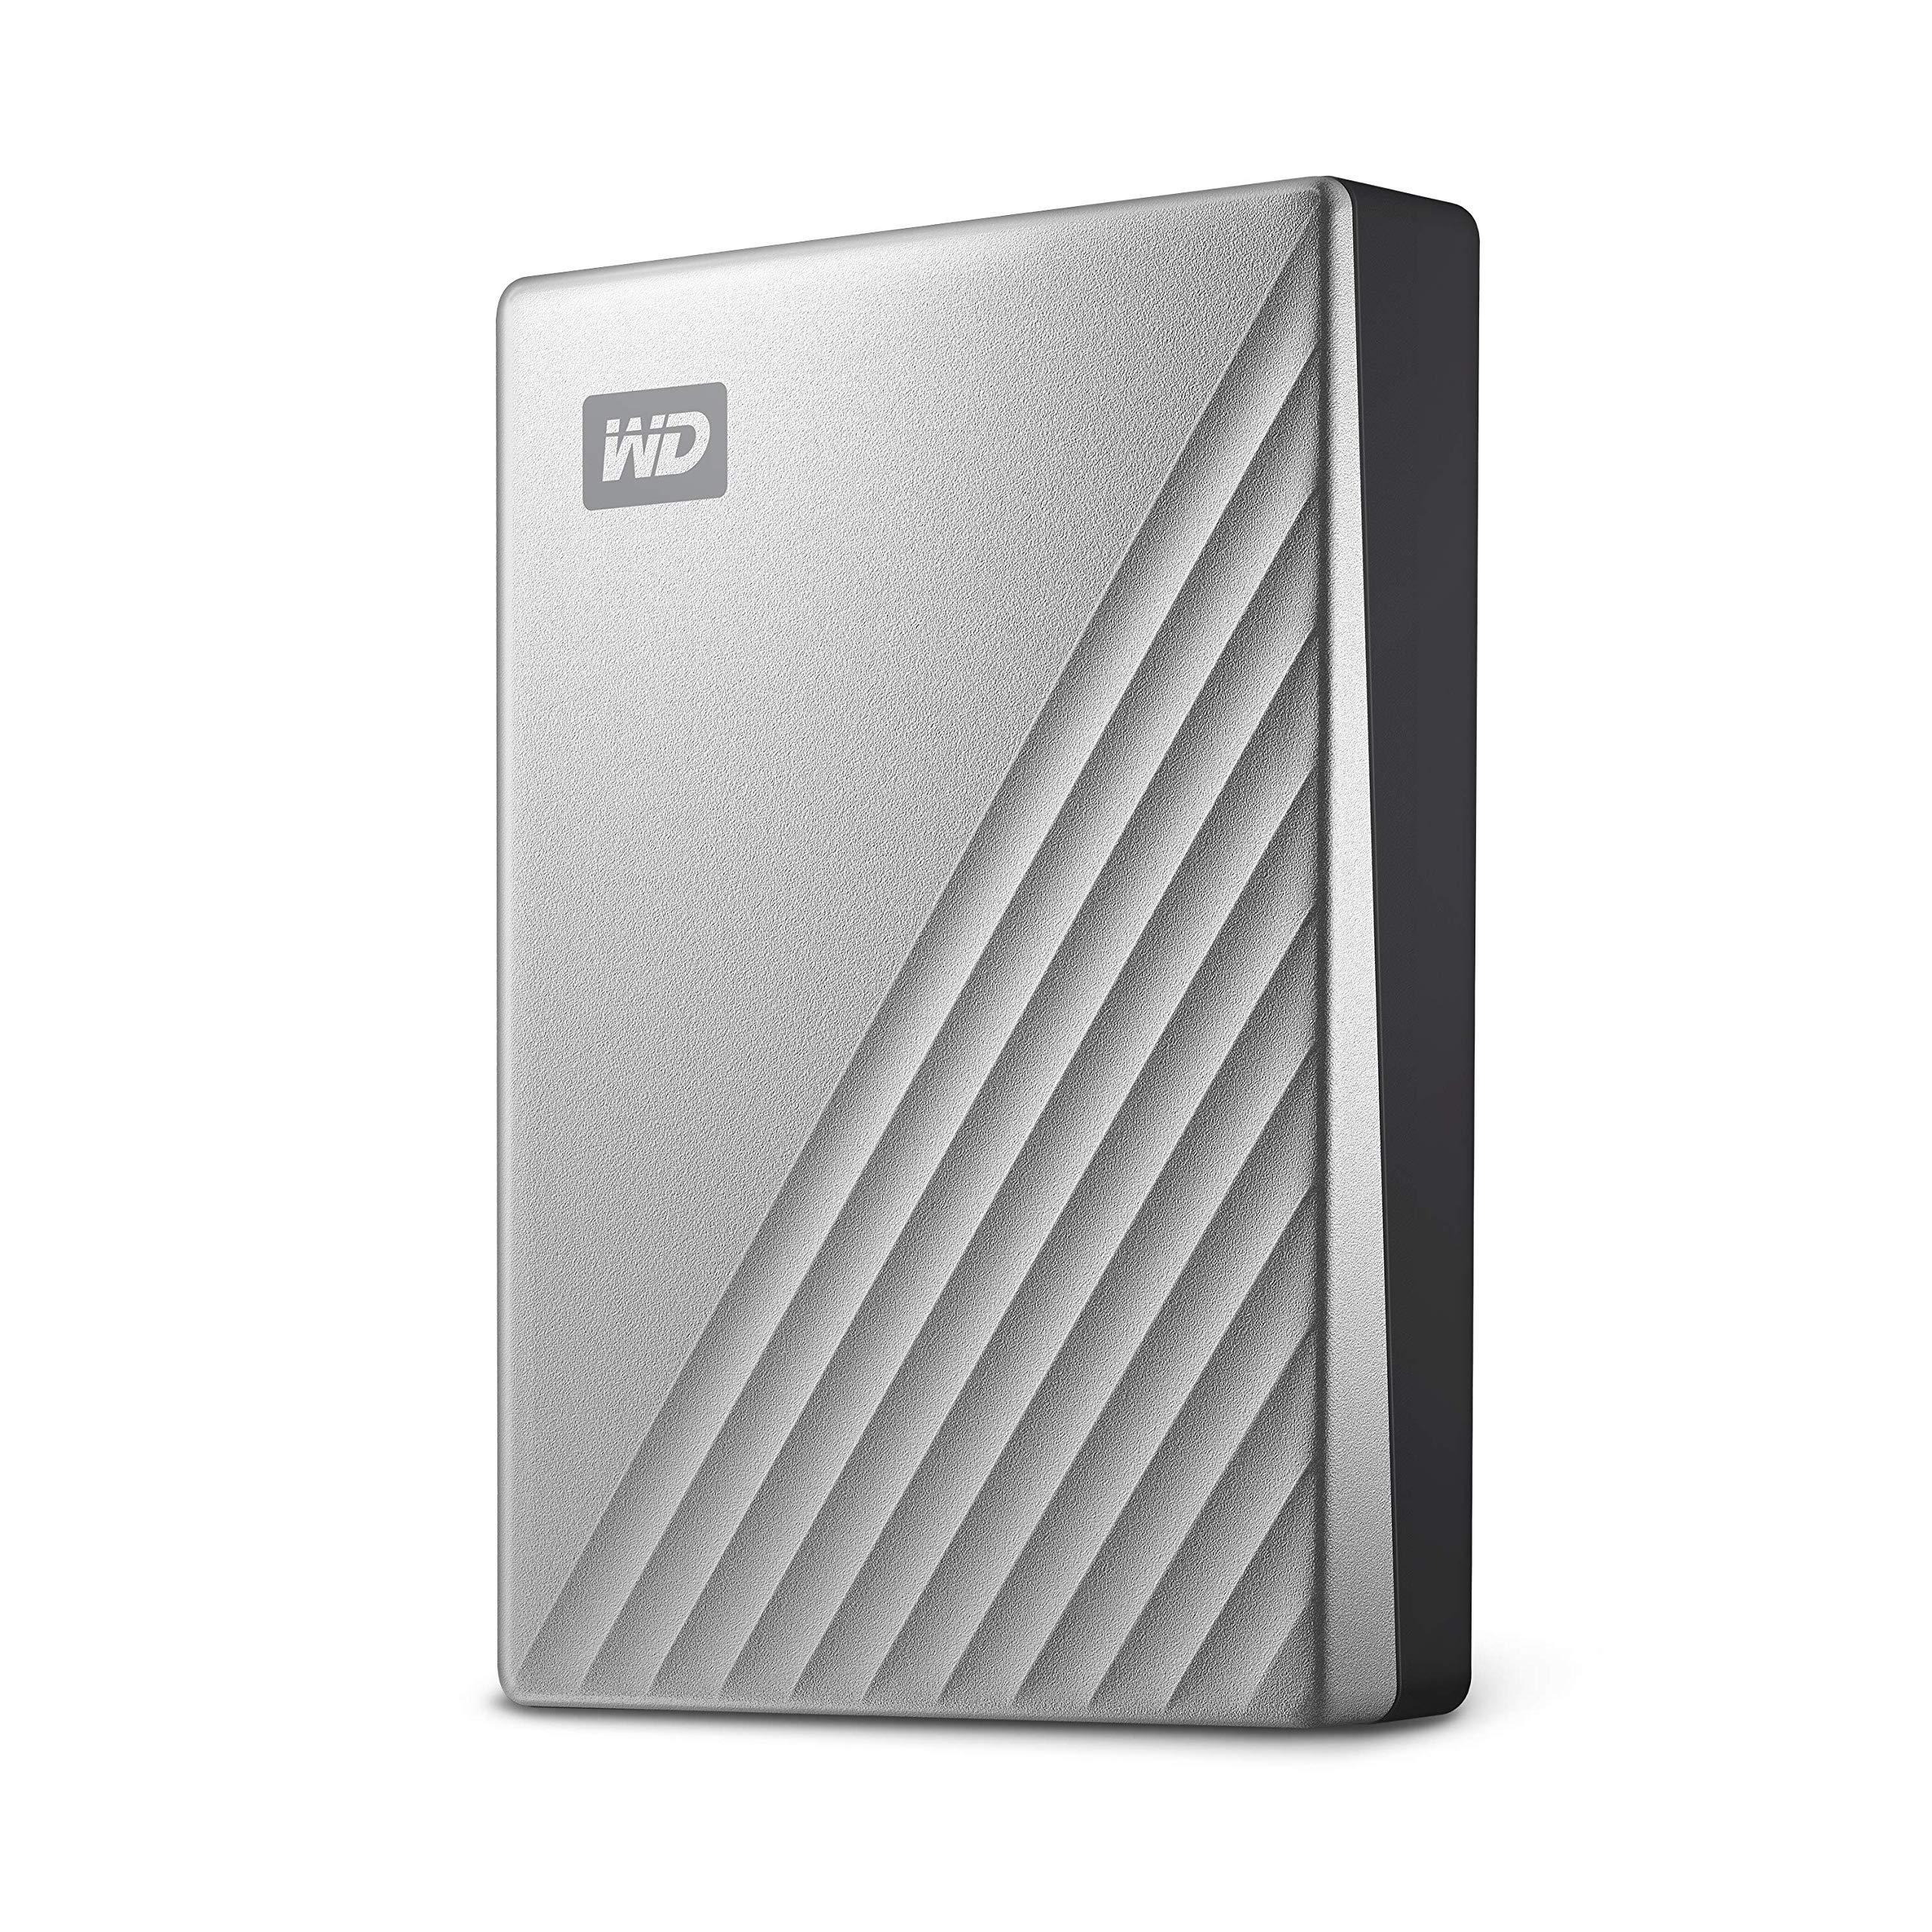 Western Digital 4TB My Passport Ultra Silver Portable External Hard Drive, USB-C - WDBFTM0040BSL-WESN